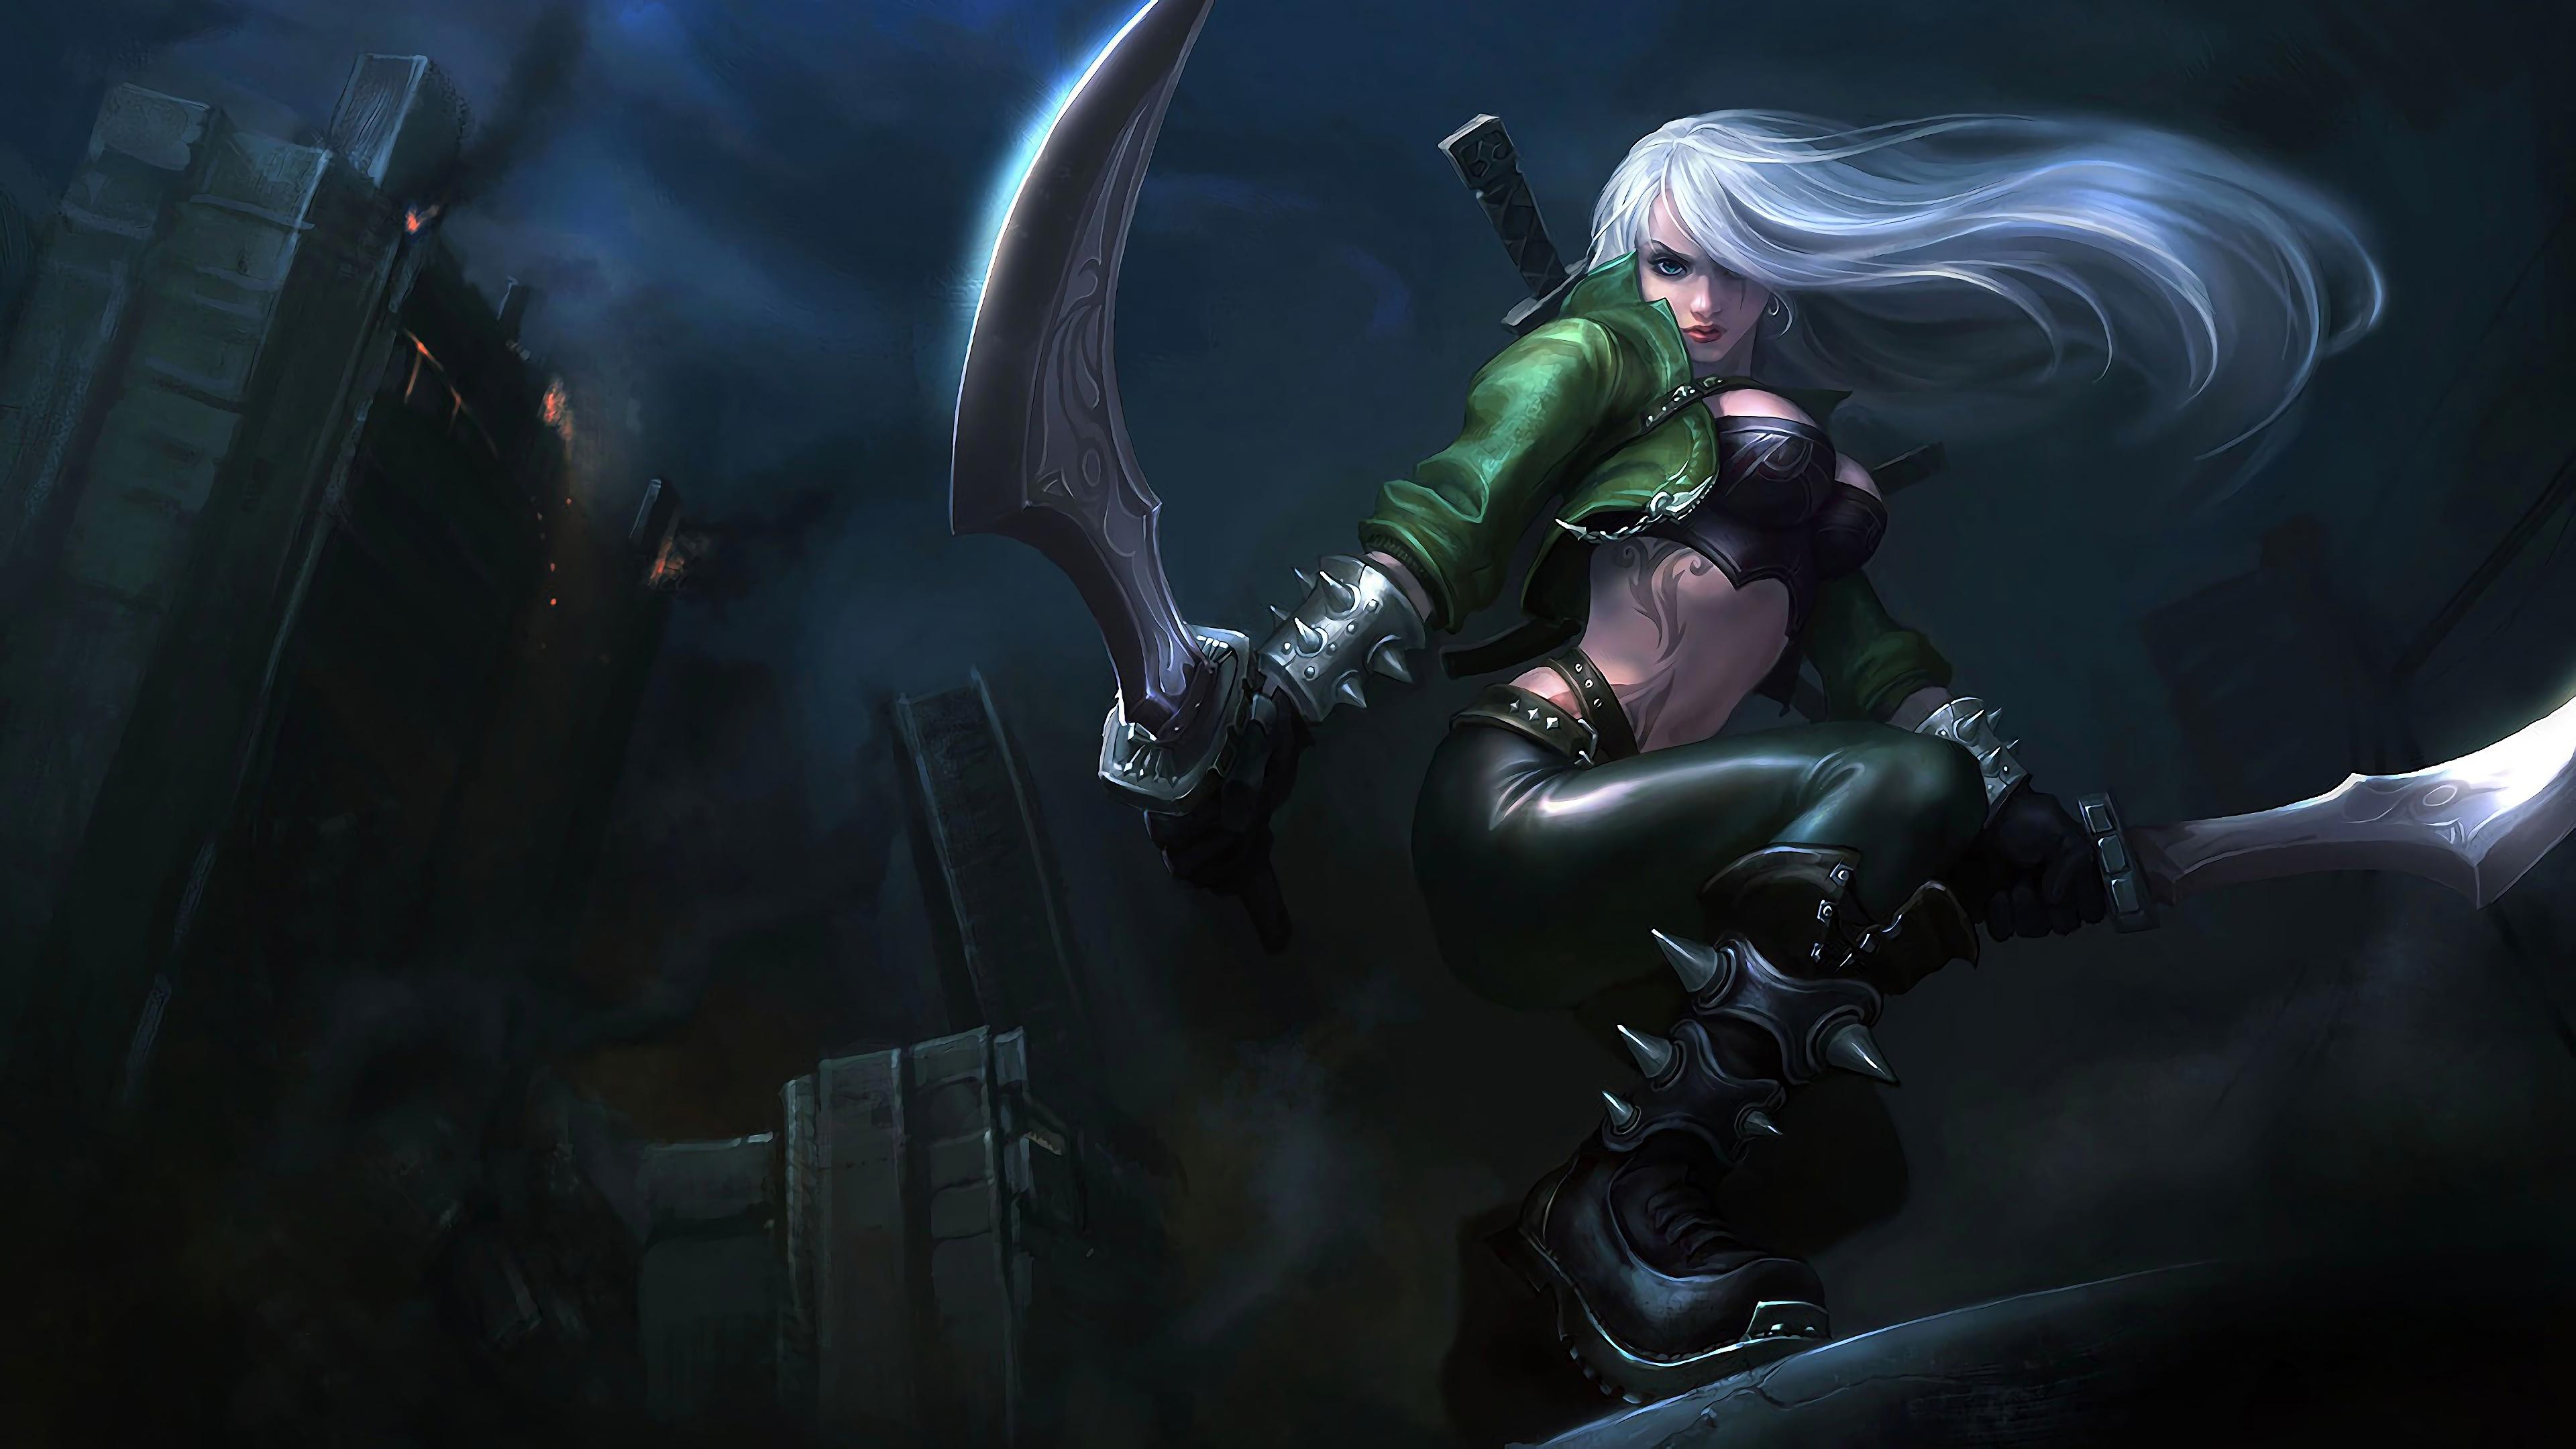 Wallpaper 4k Mercenary Katarina Lol Splash Art League Of Legends